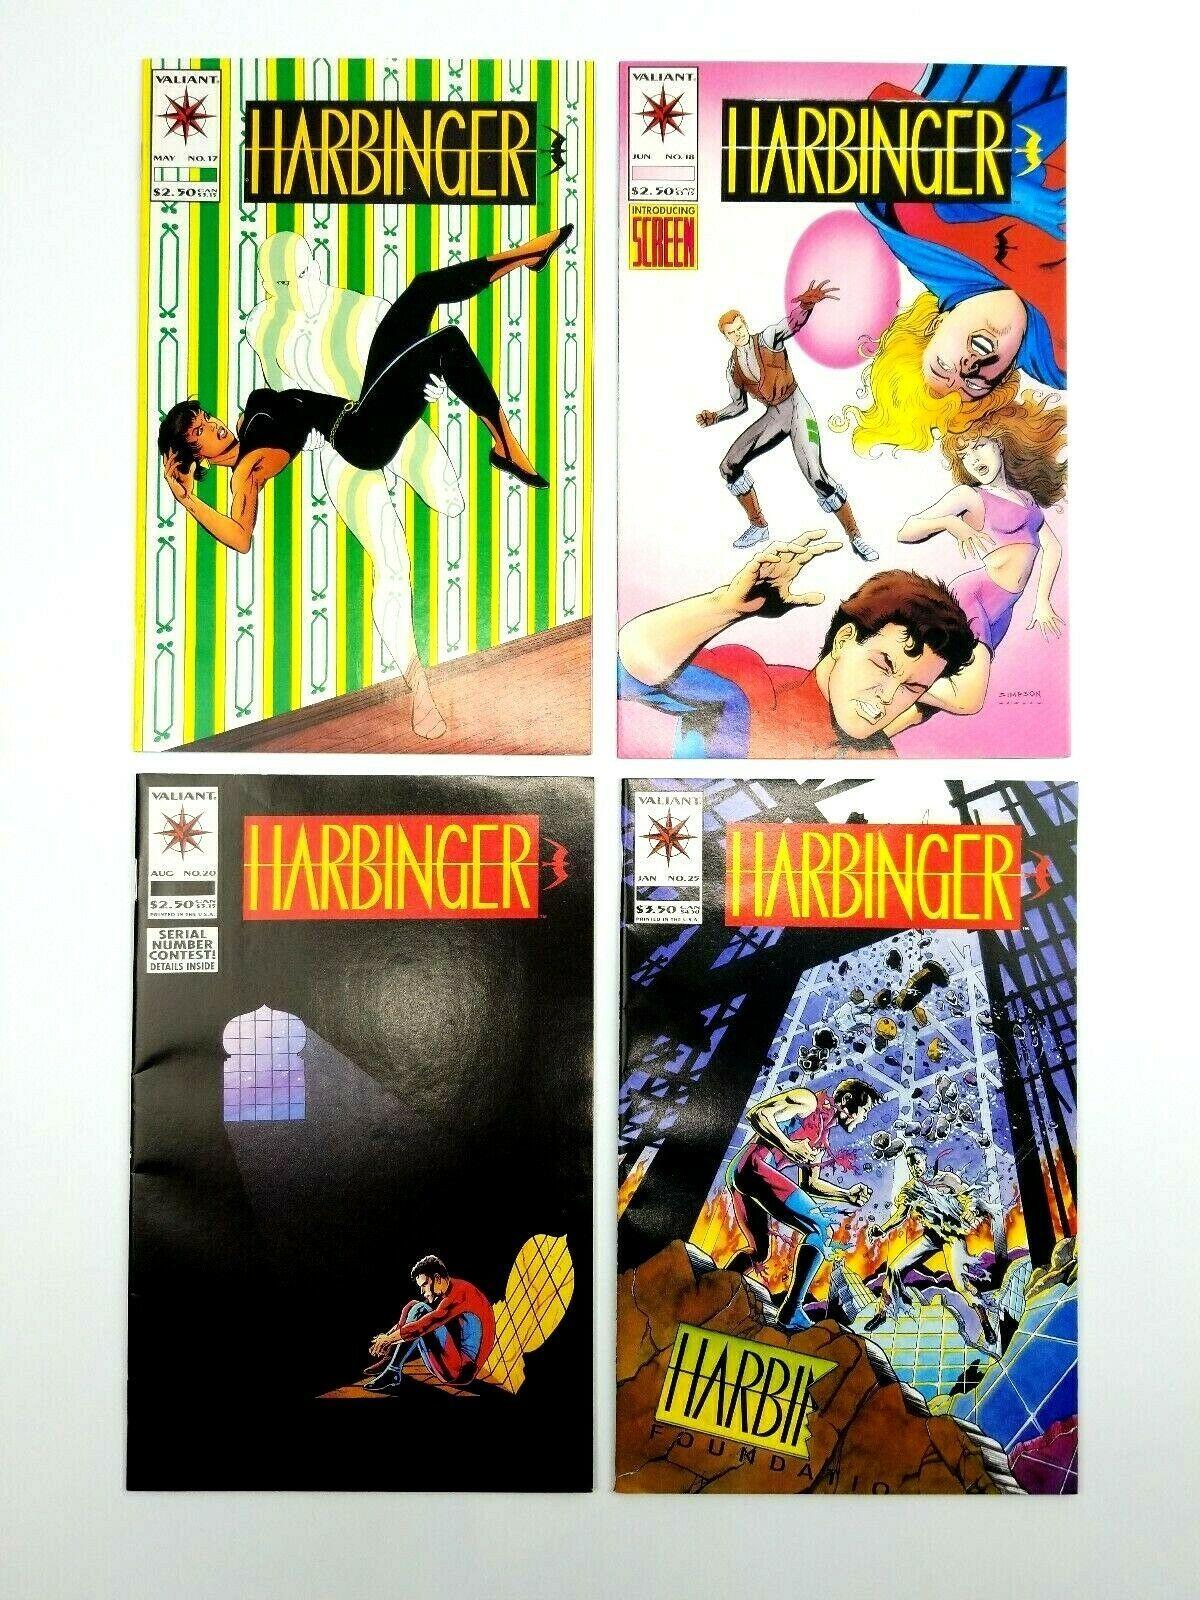 Harbinger 10 16 17 18 20 25 Harbinger Files #1 Valiant Comic Book Lot image 4